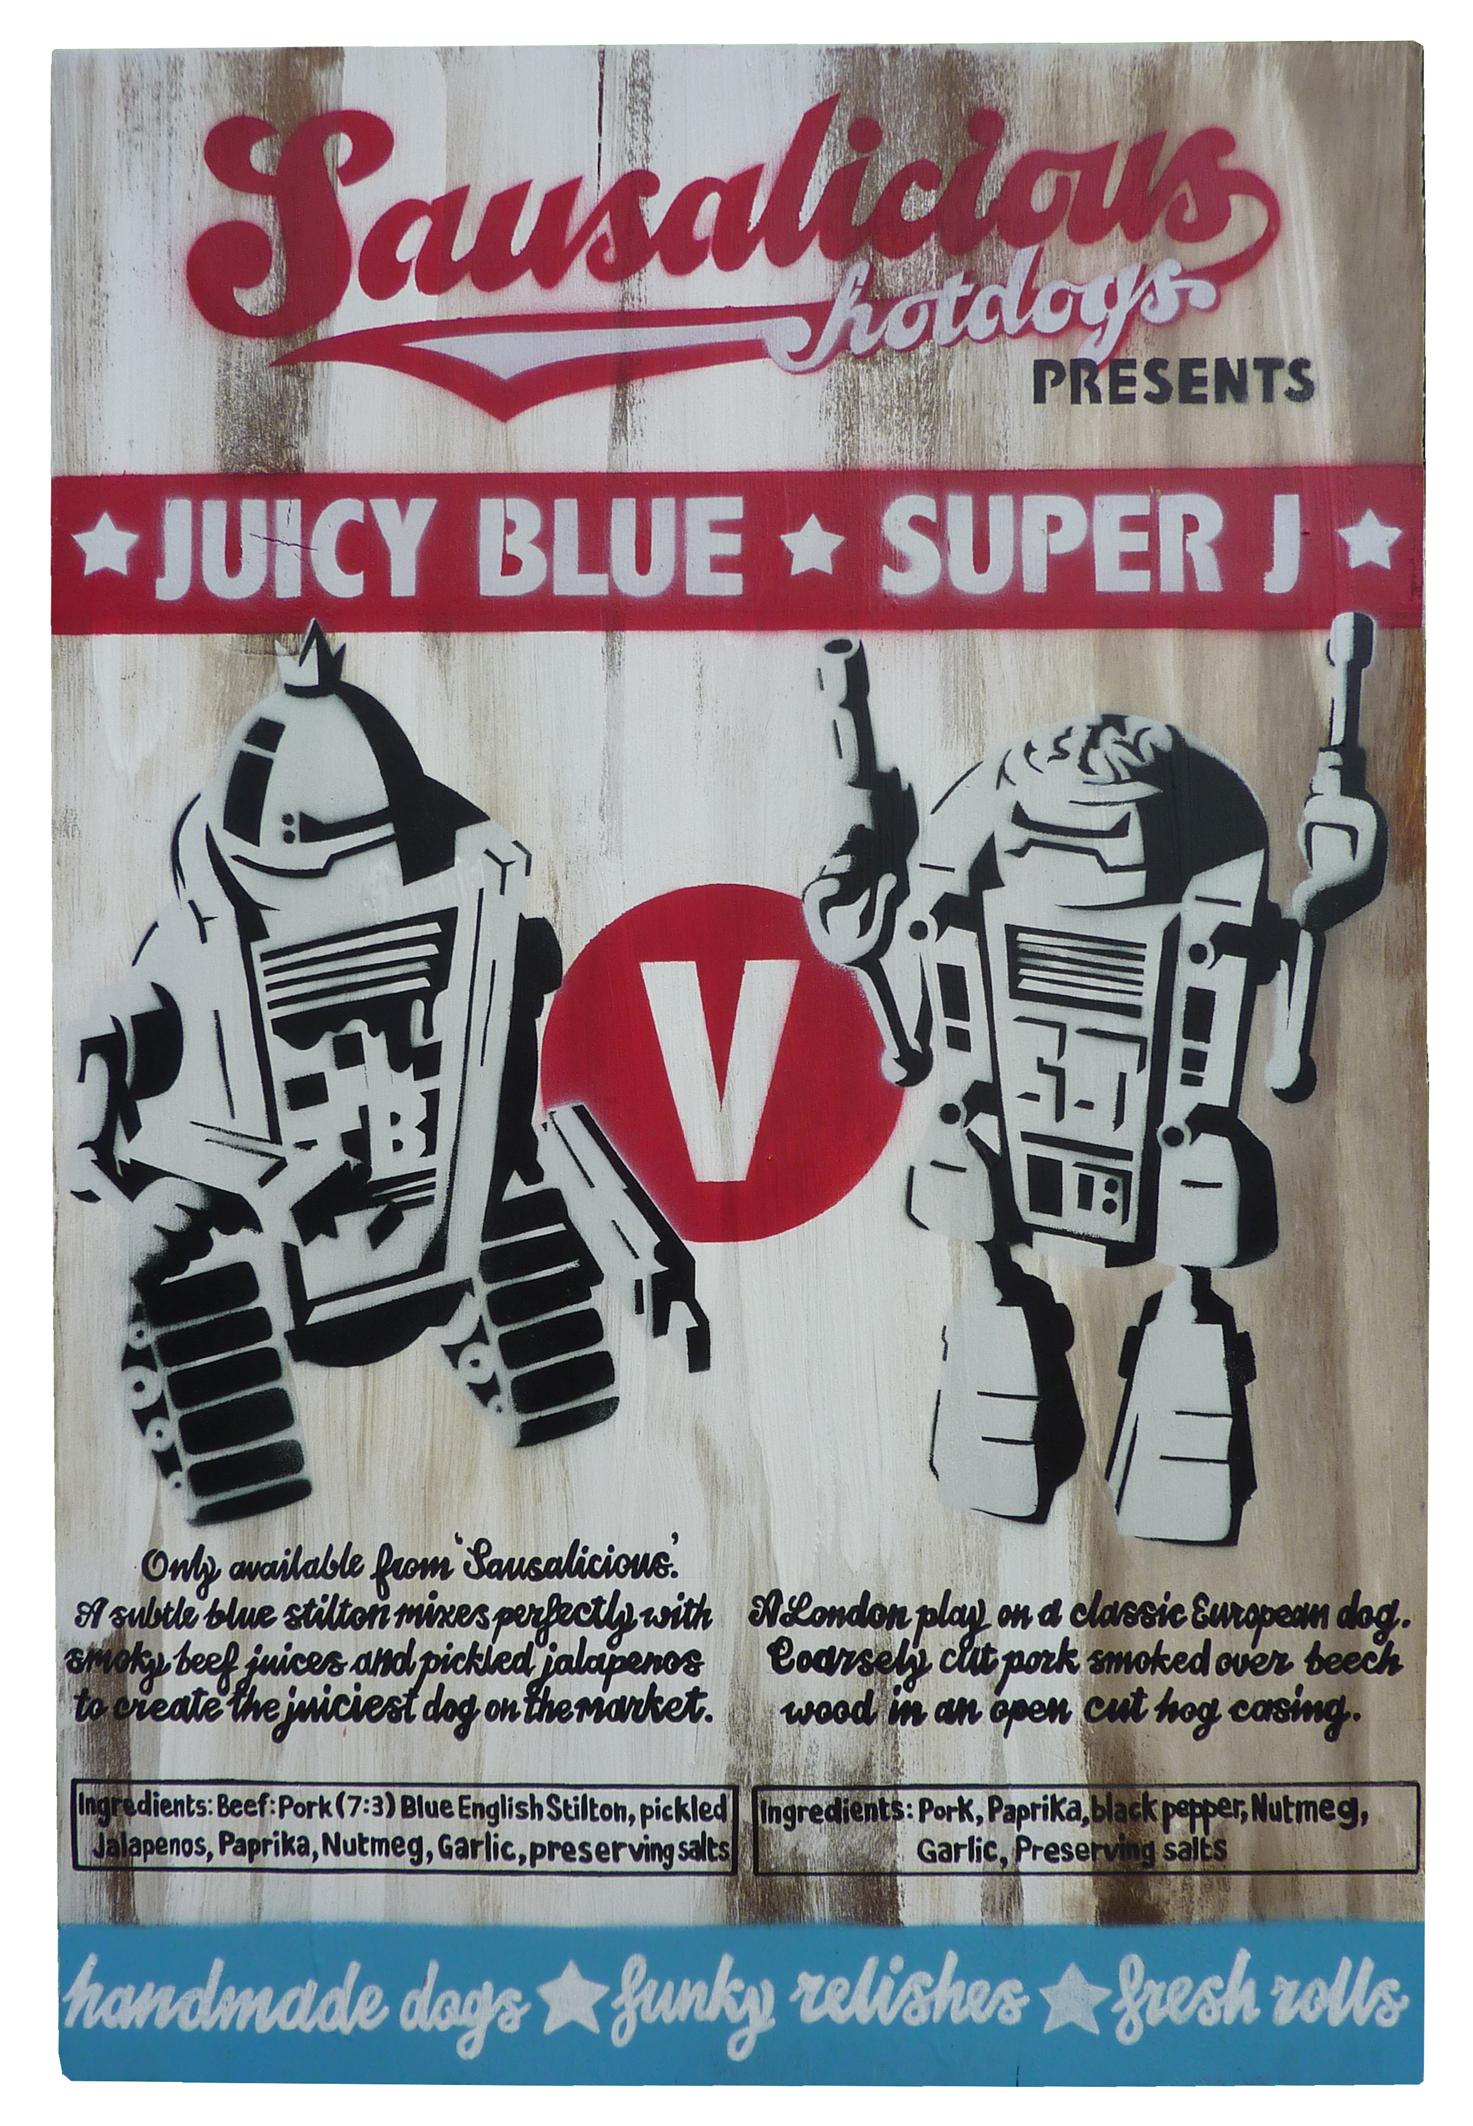 juicy blue and super j 2